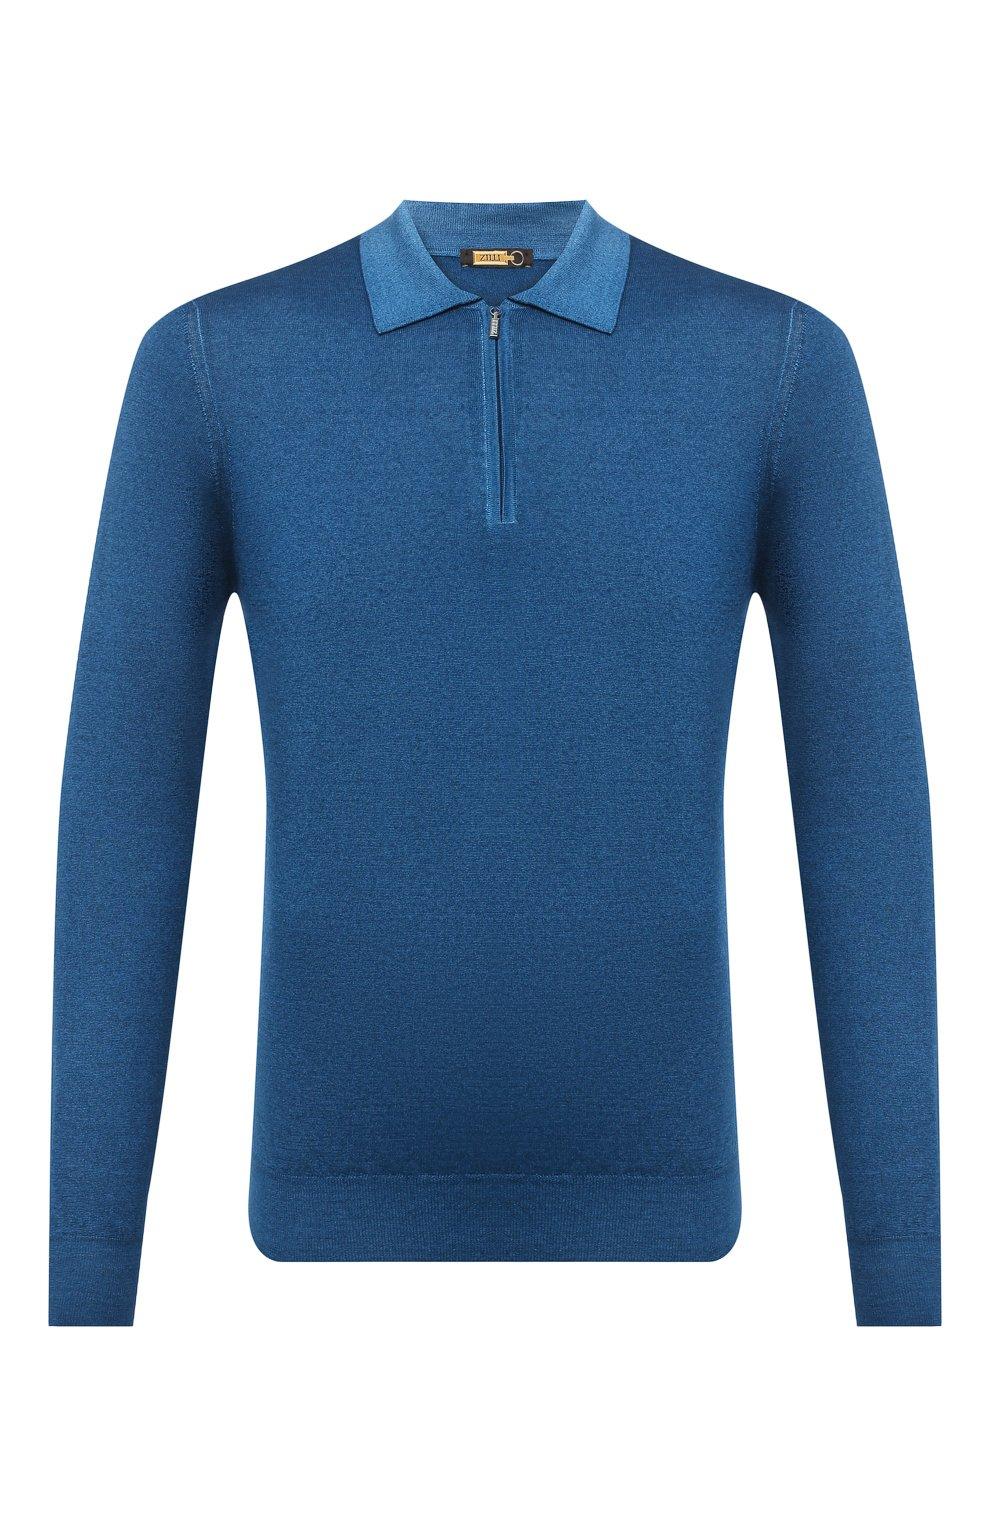 Мужское поло из кашемира и шелка ZILLI синего цвета, арт. MBU-PZ002-NUAG1/ML01 | Фото 1